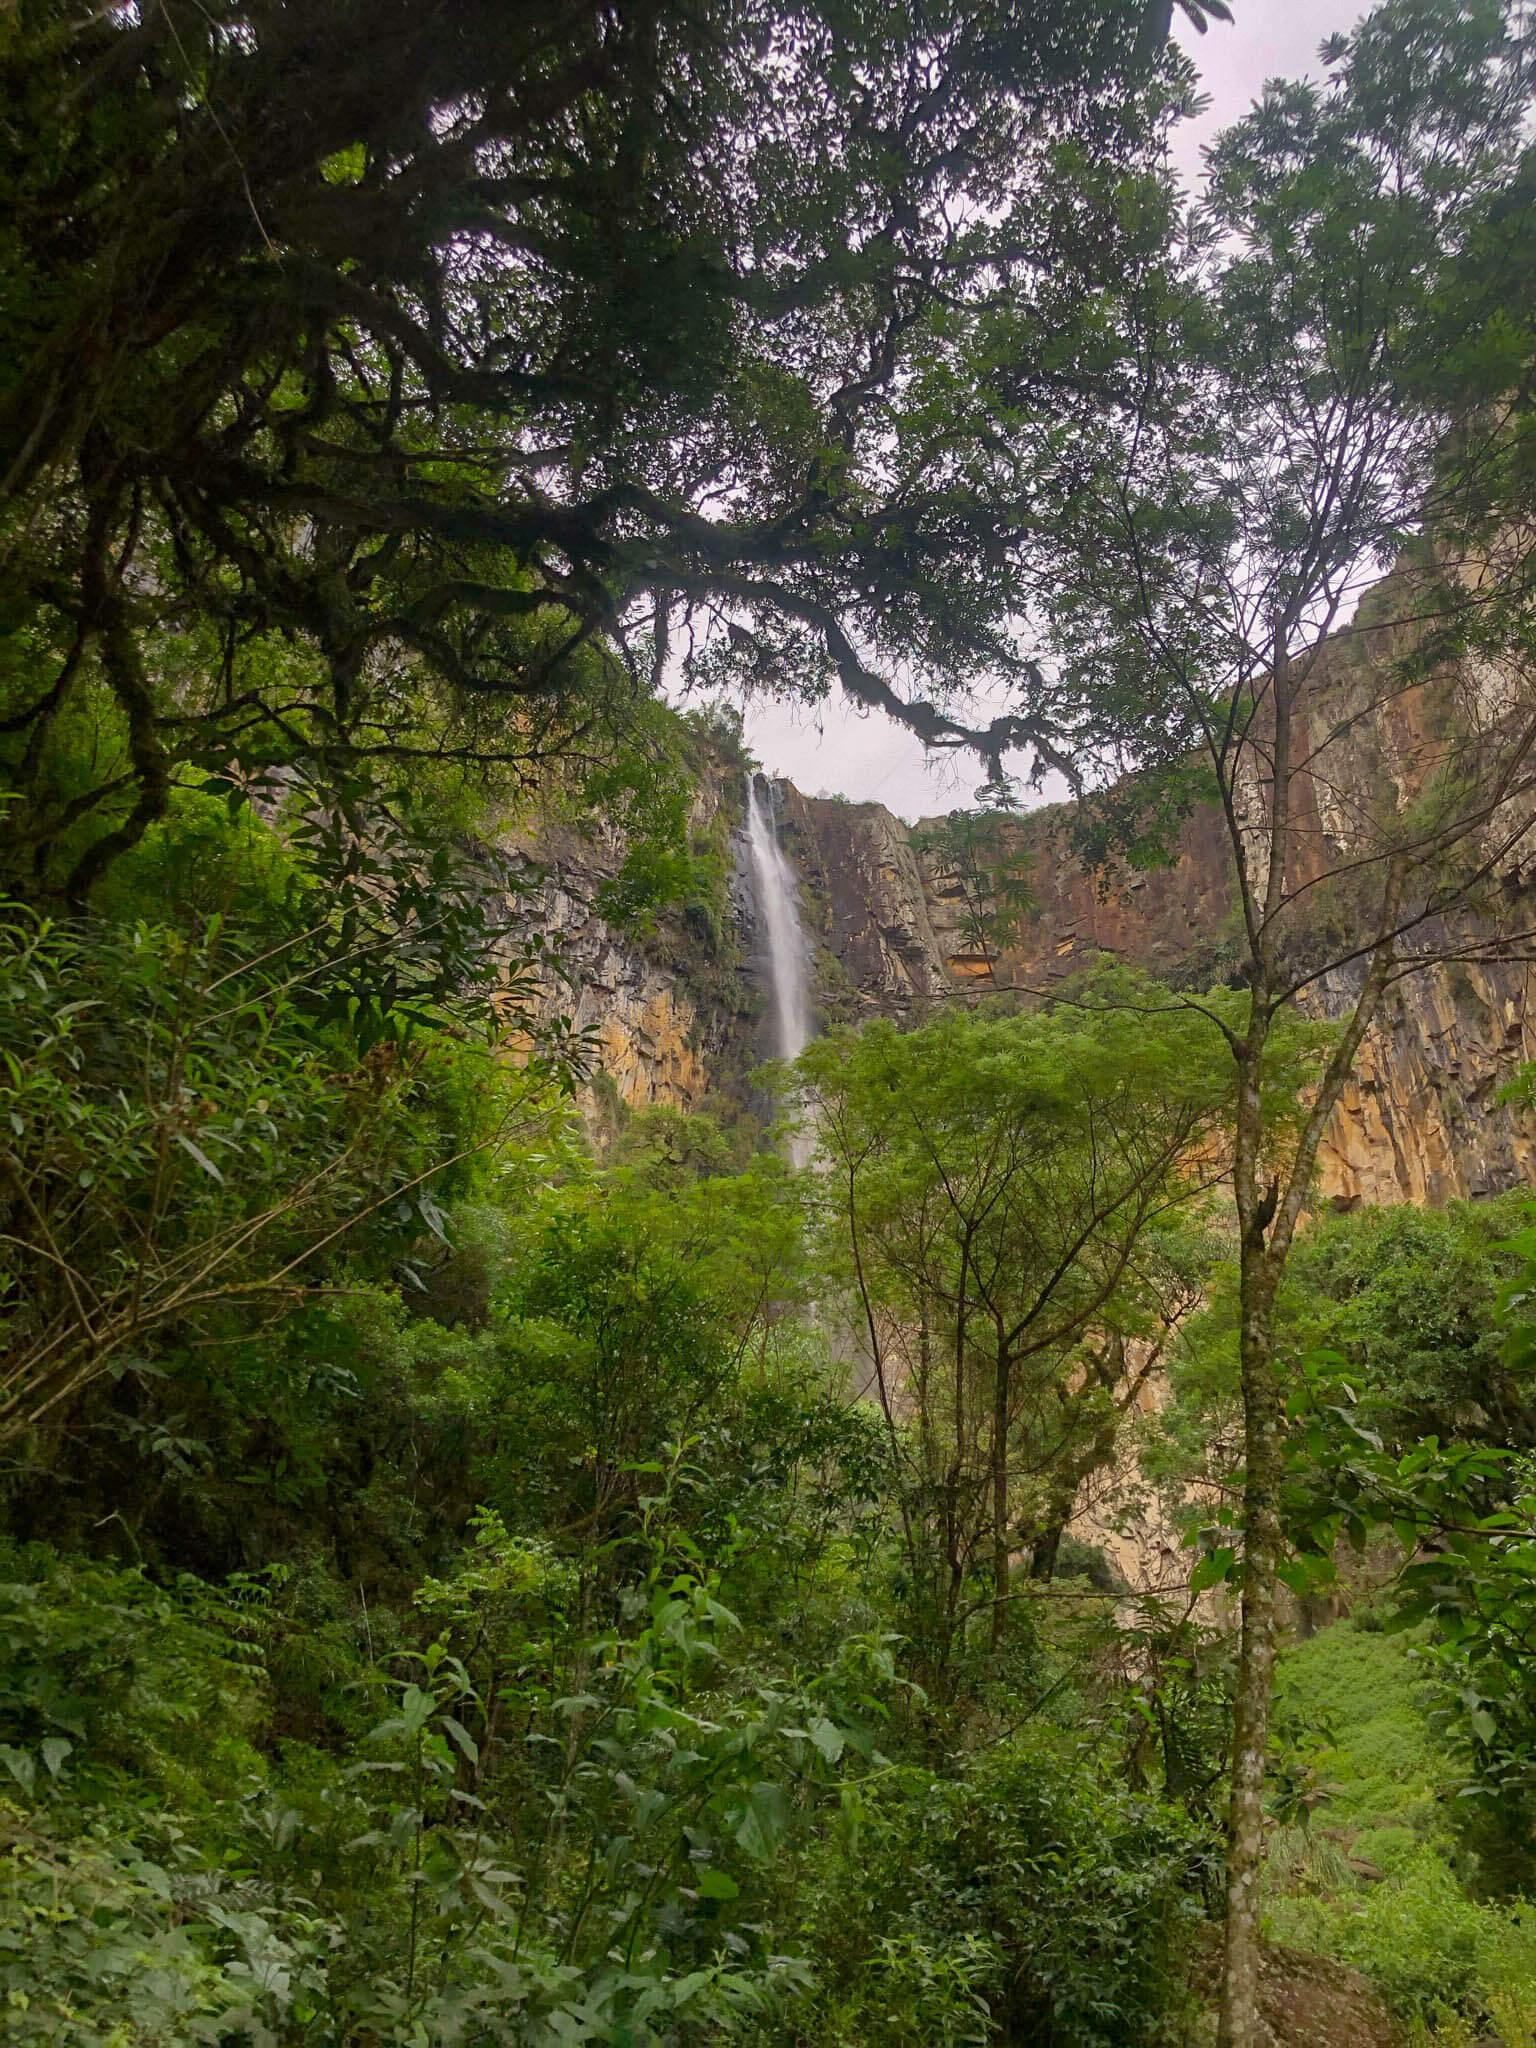 cachoeira-do-avencal (6)